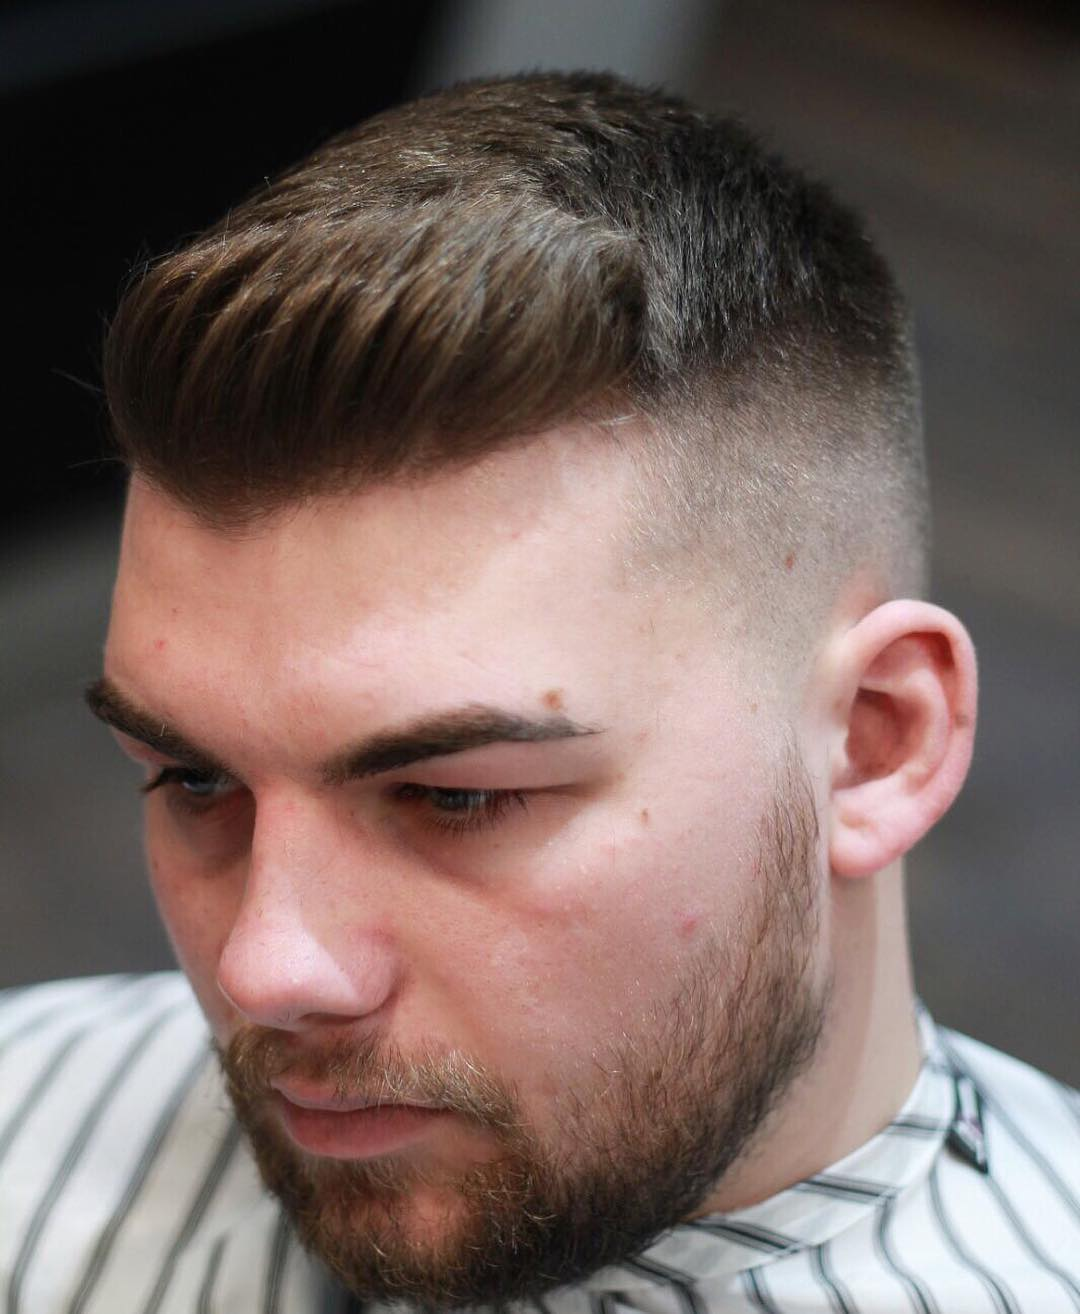 Last Trendy Short Haircut Styles For Boys in 2017 7